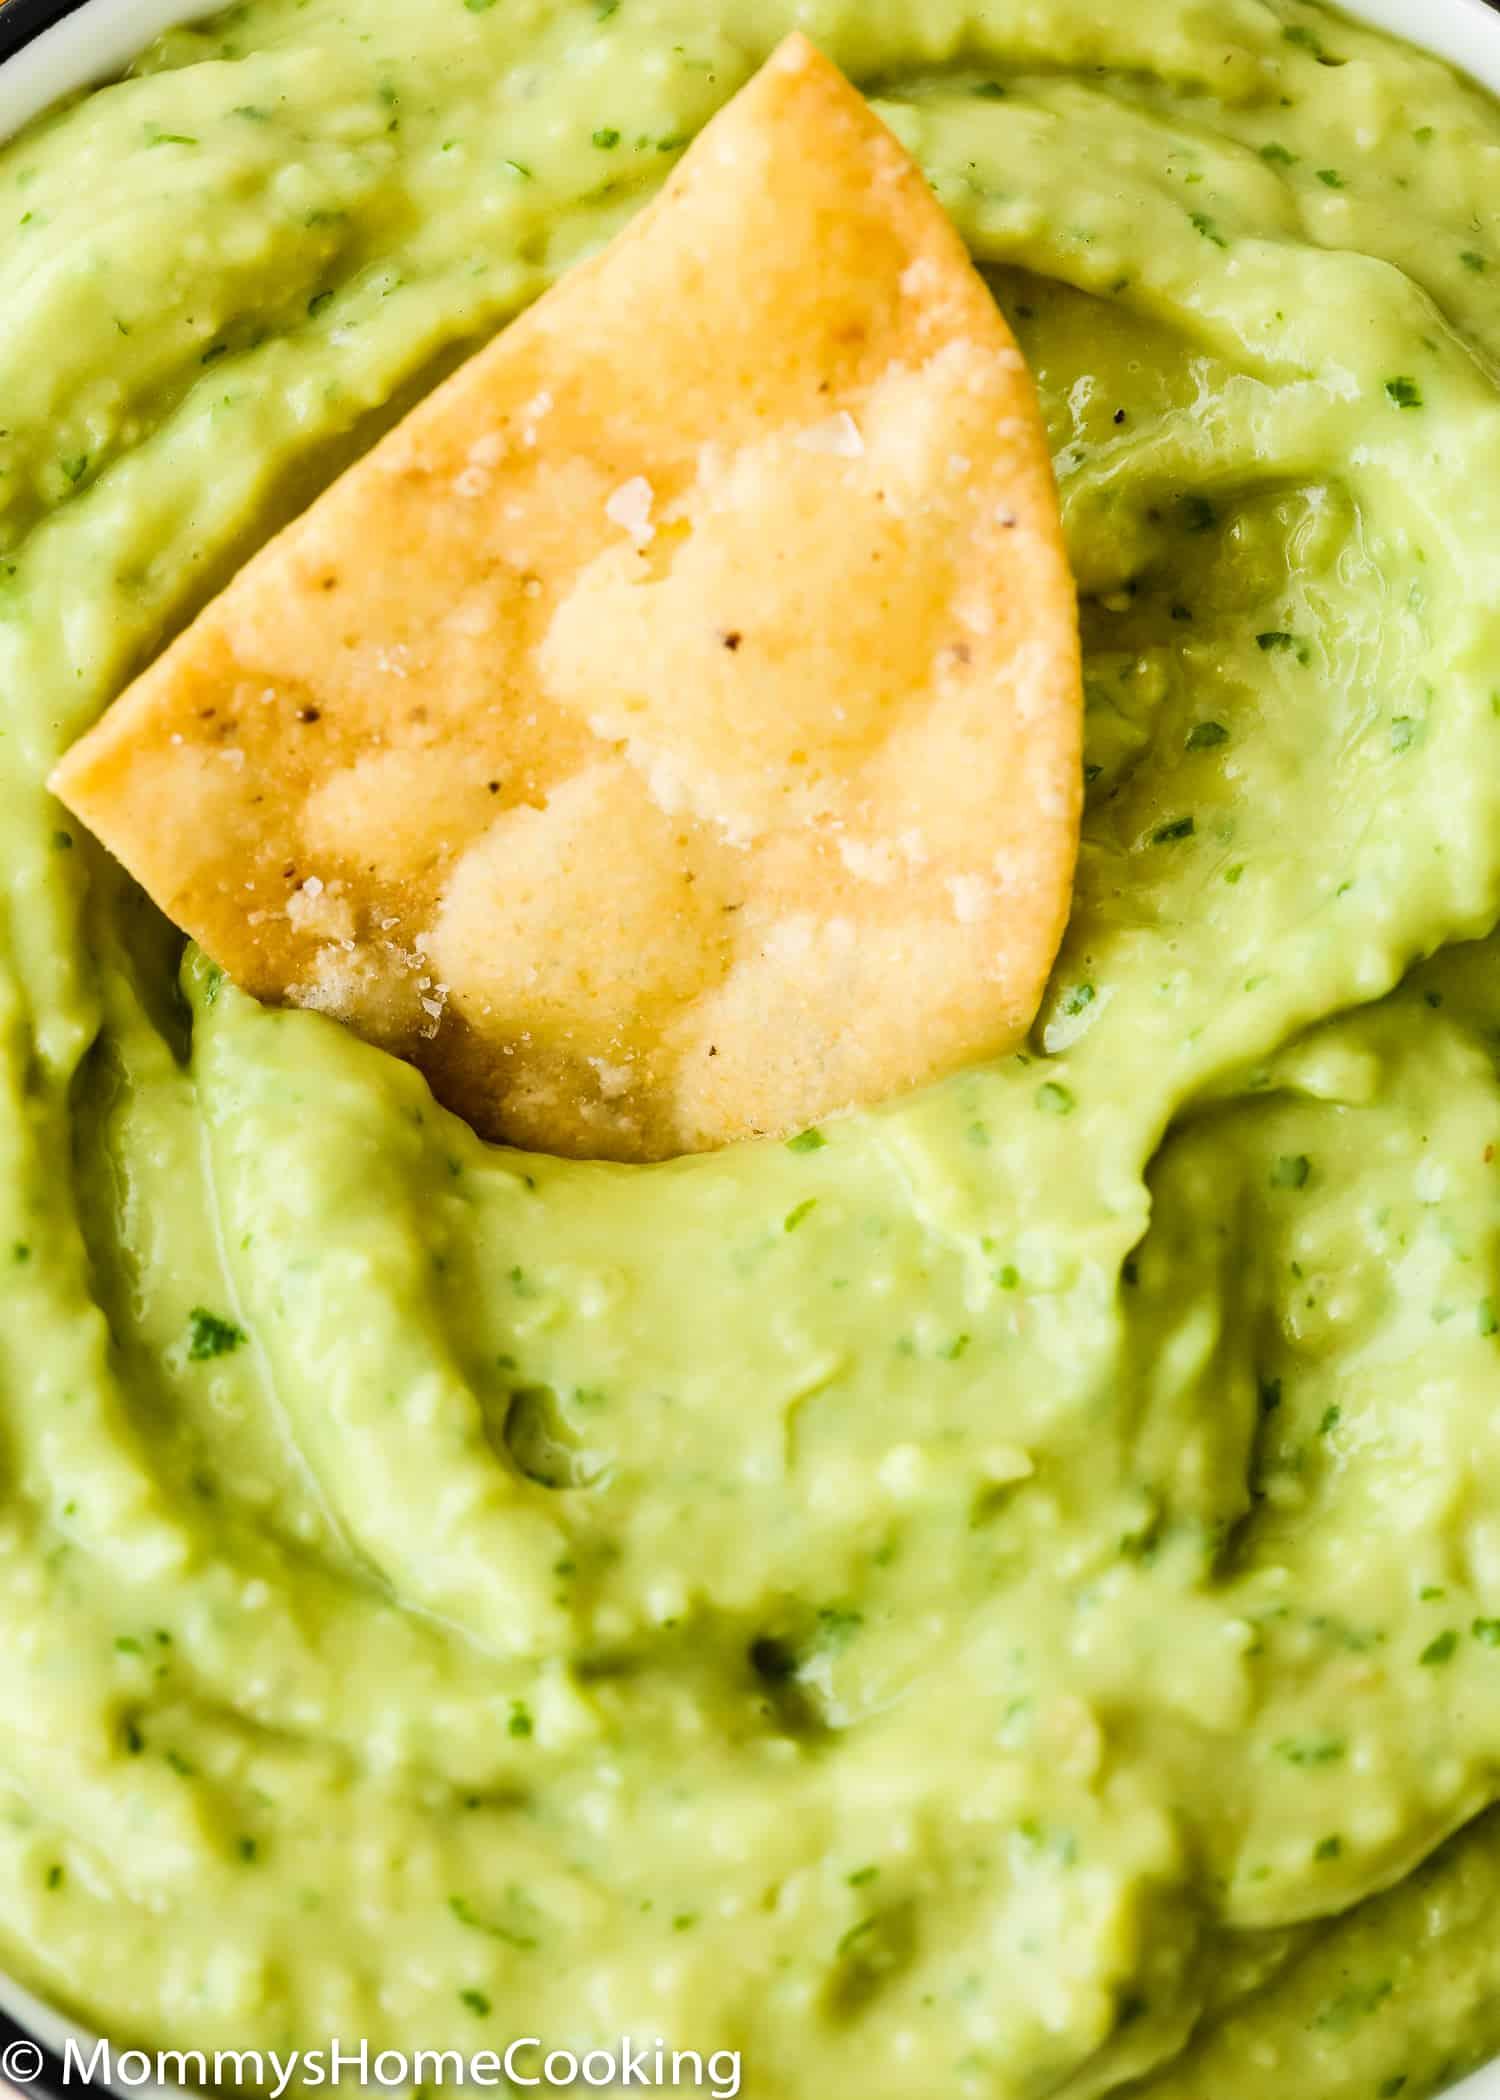 avocado sauce close-up with a tortilla chip